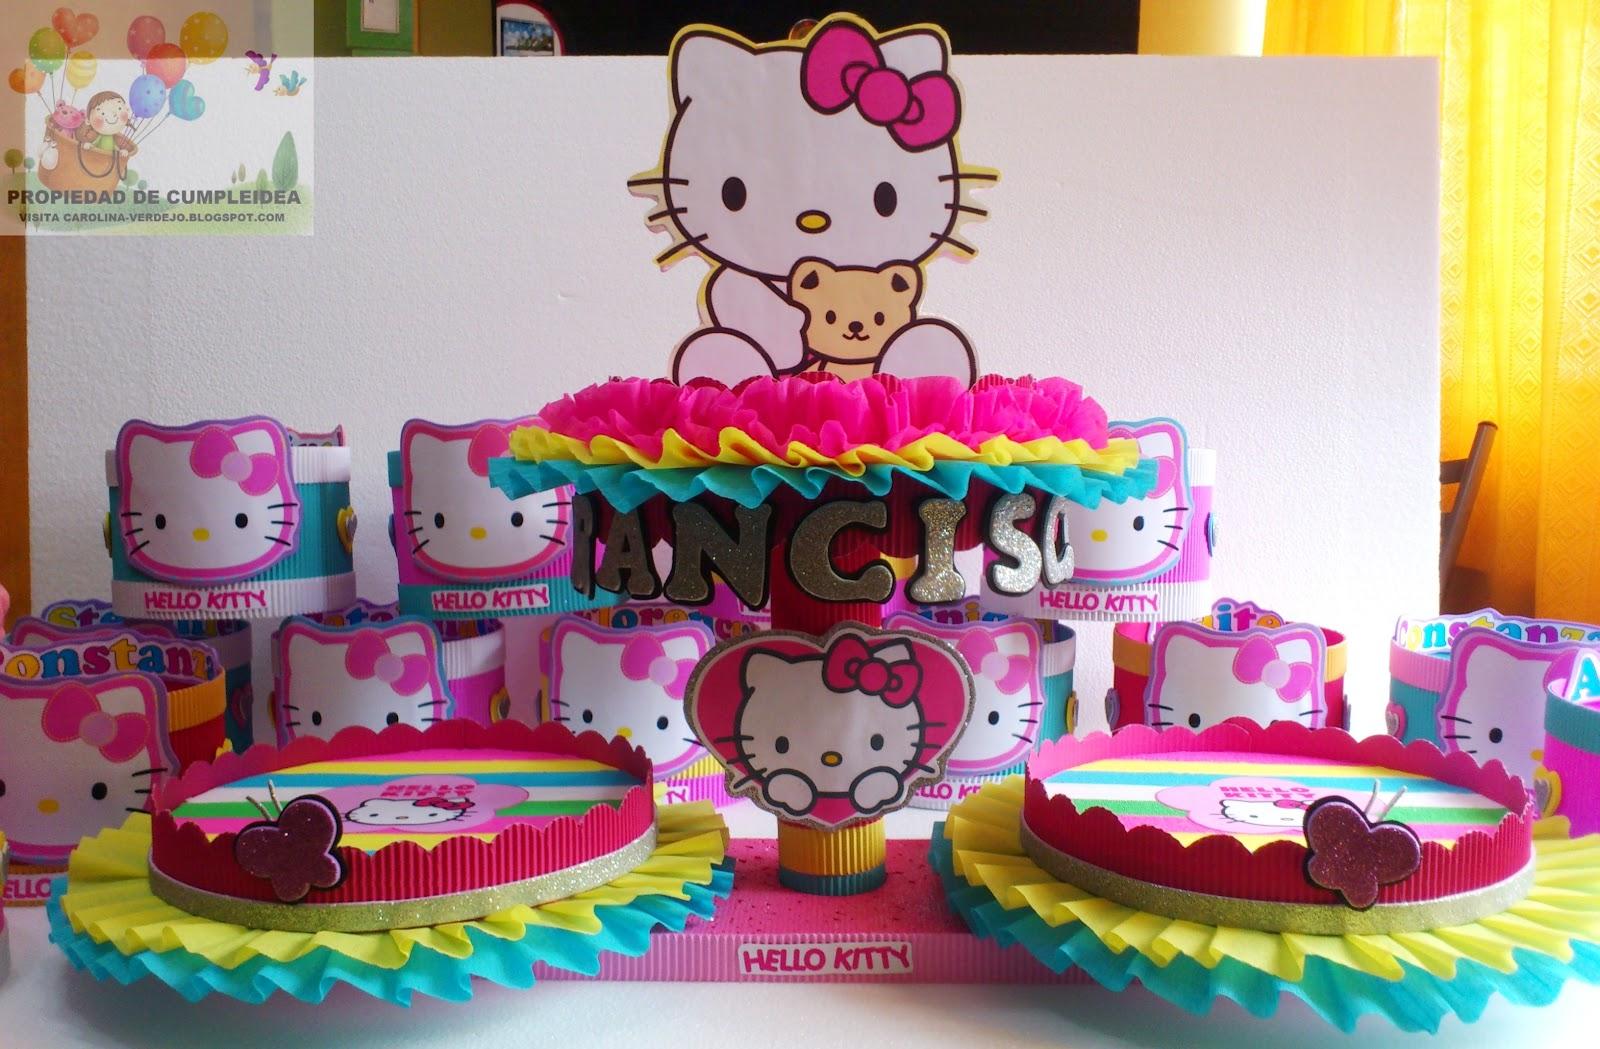 Decoraciones infantiles de hello kitty imagui - Decoracion hello kitty ...